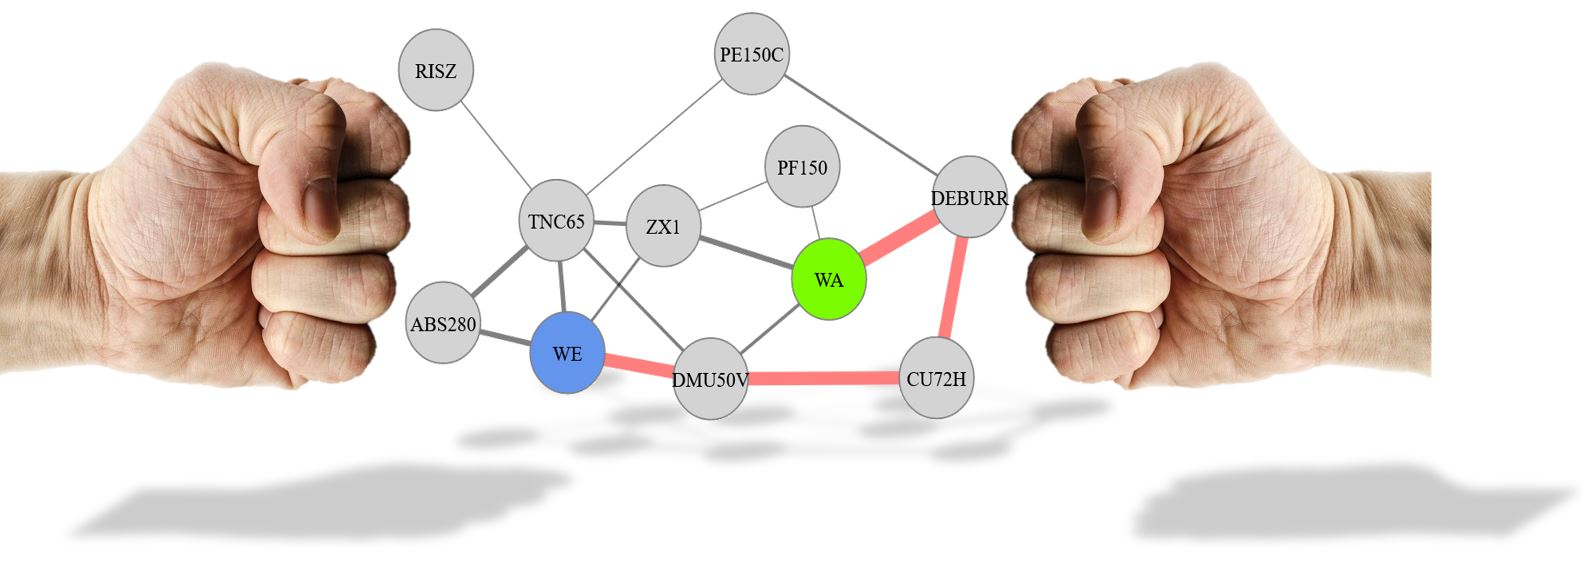 Kräftebasierte Fabrik-Layoutplanung mit Force-Directed-Graphs